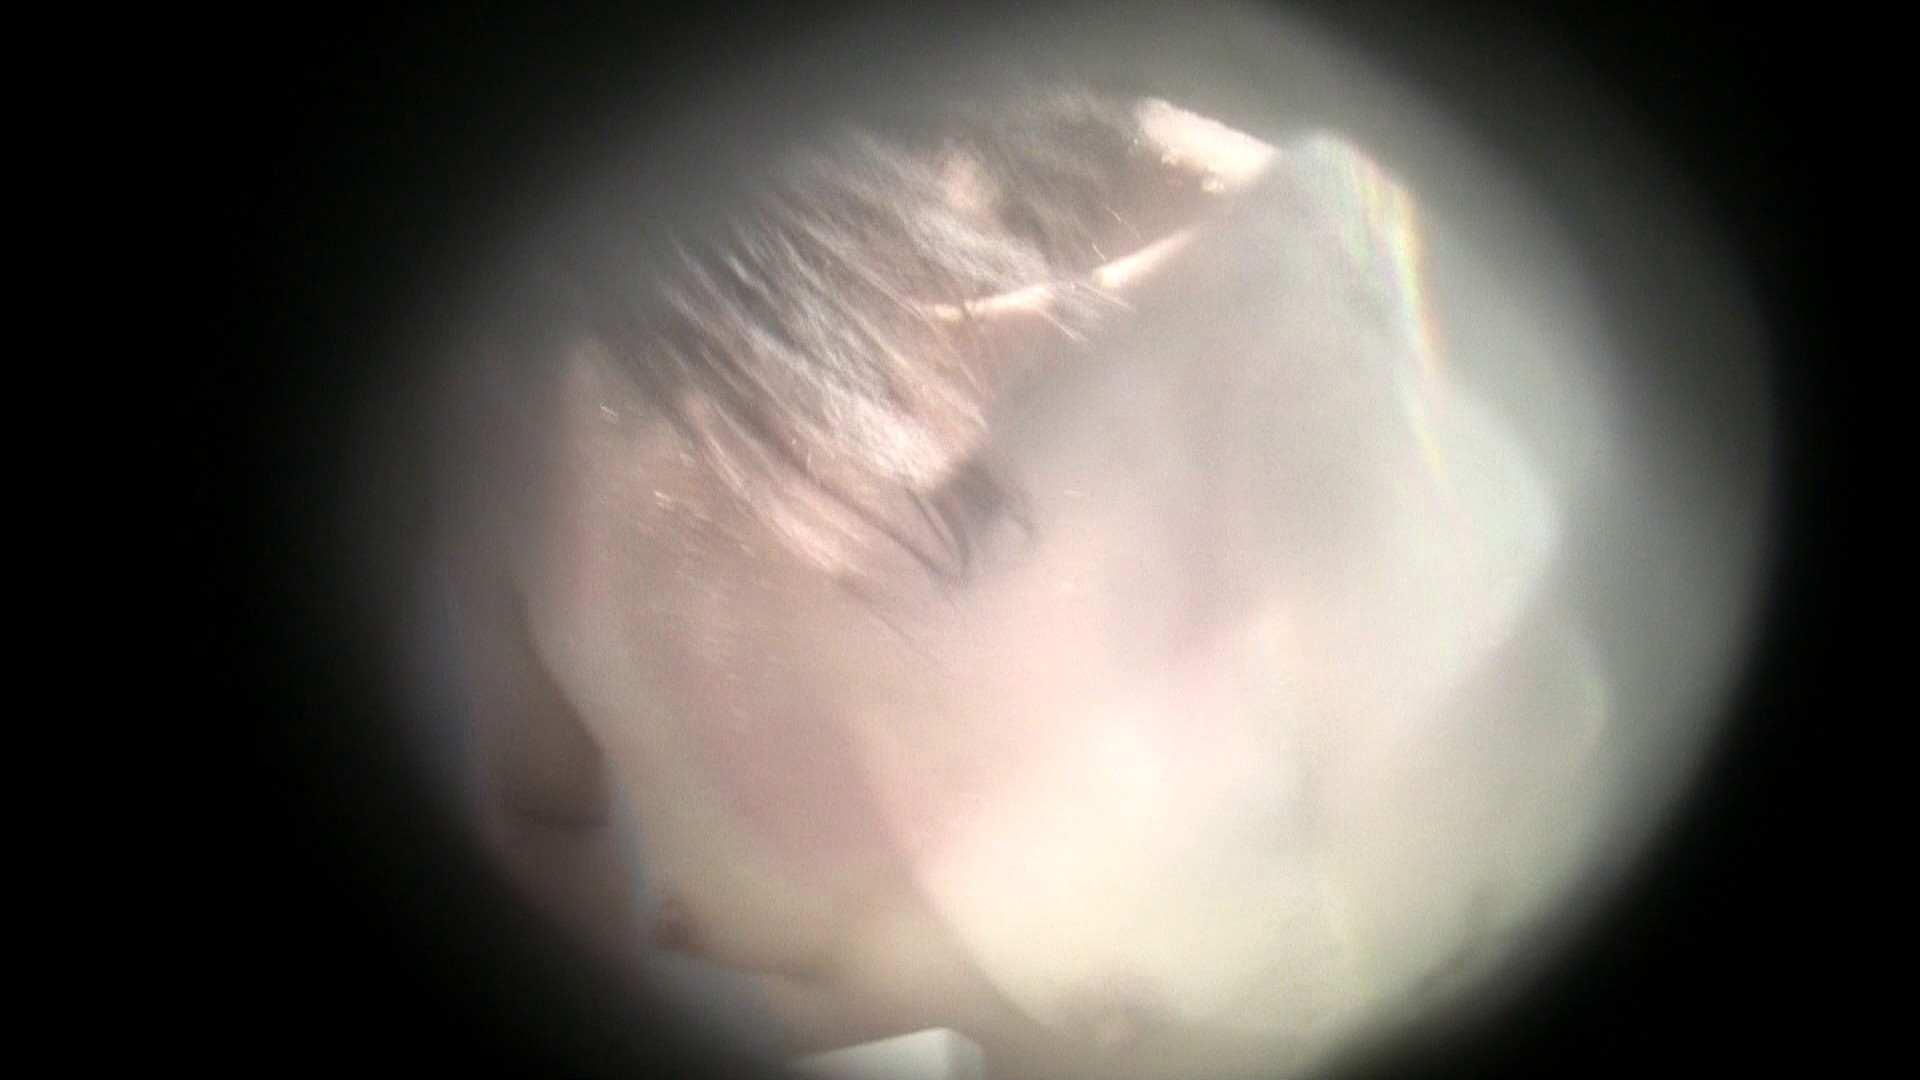 NO.11 年増の一本道!!中身ハミ出てます 覗き 濡れ場動画紹介 97画像 55